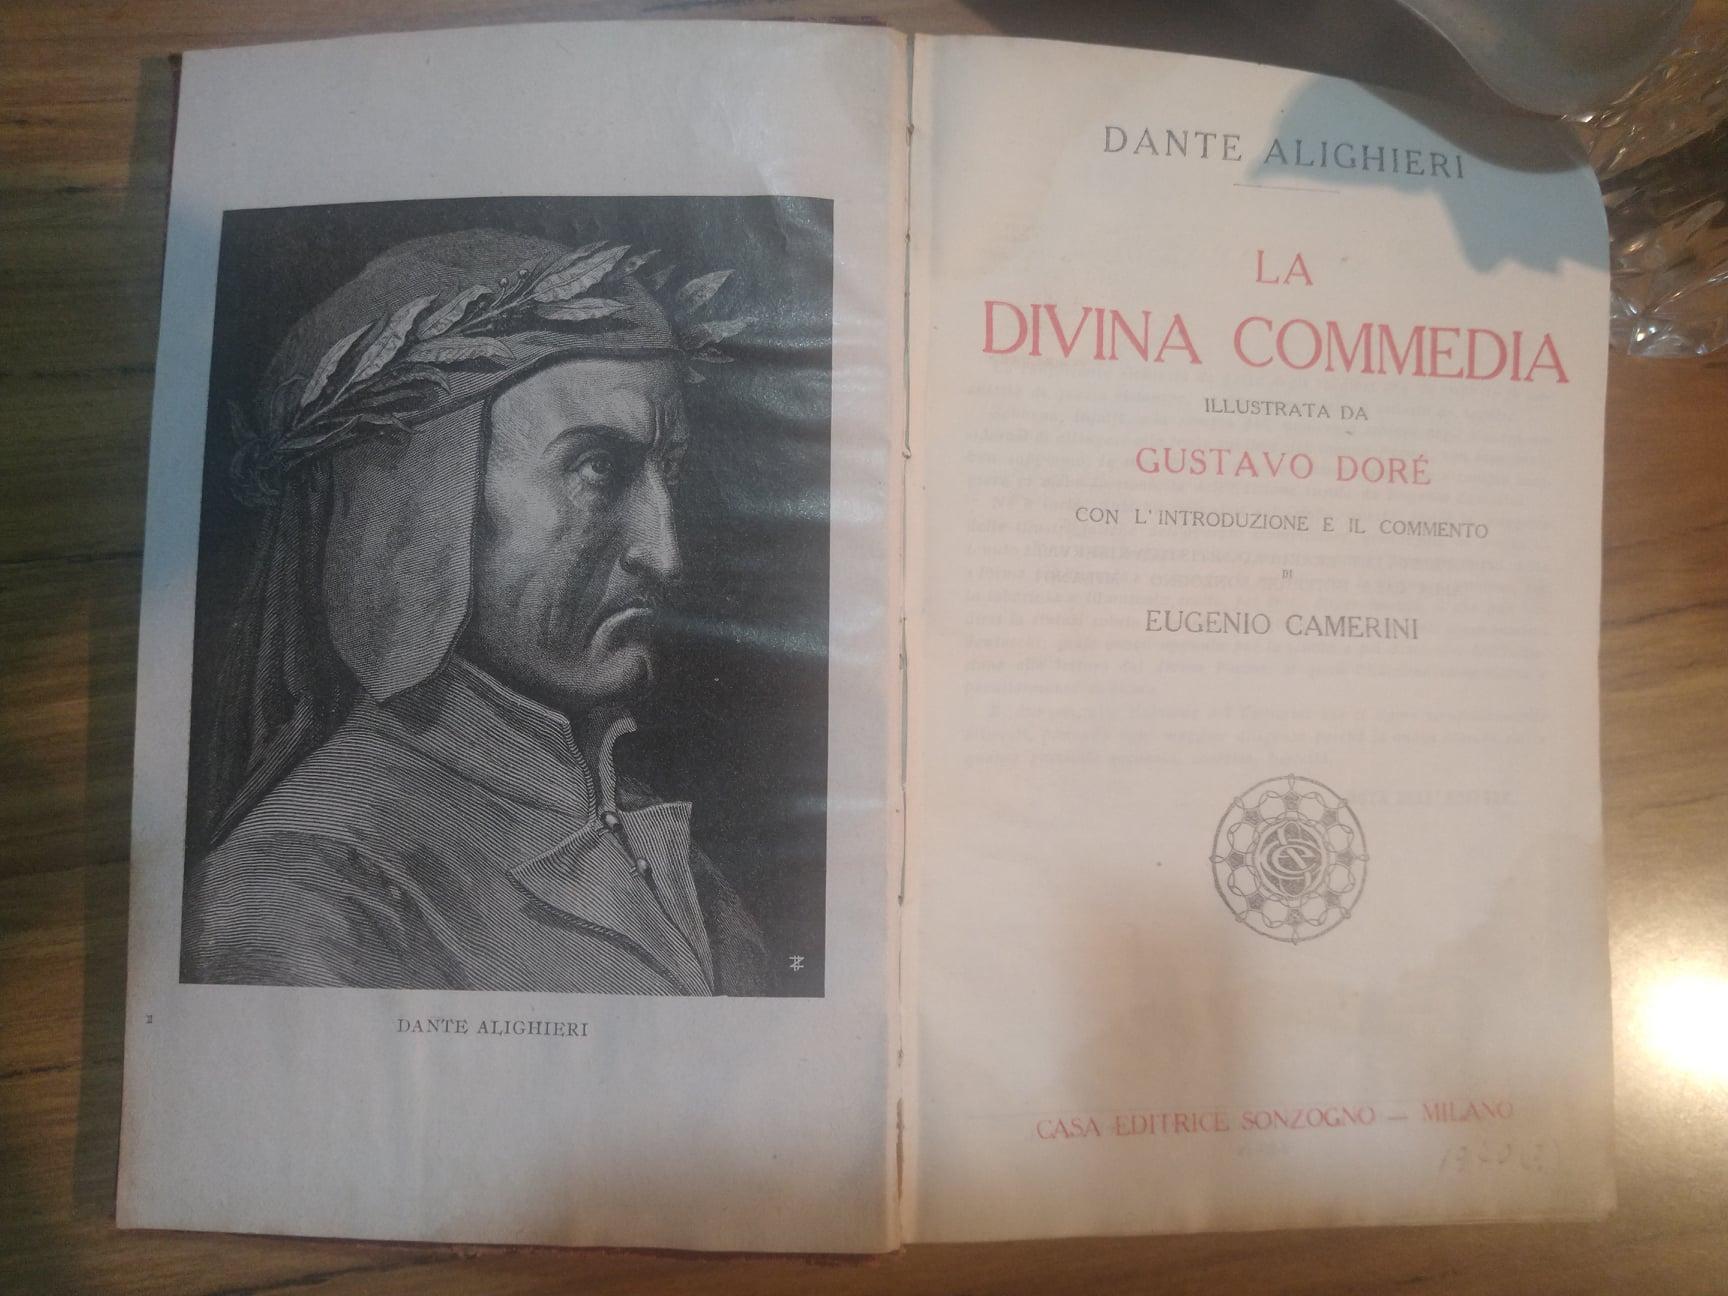 PADRE FELICIANO, DANTE ALIGHIERI Y GINO BARTALI